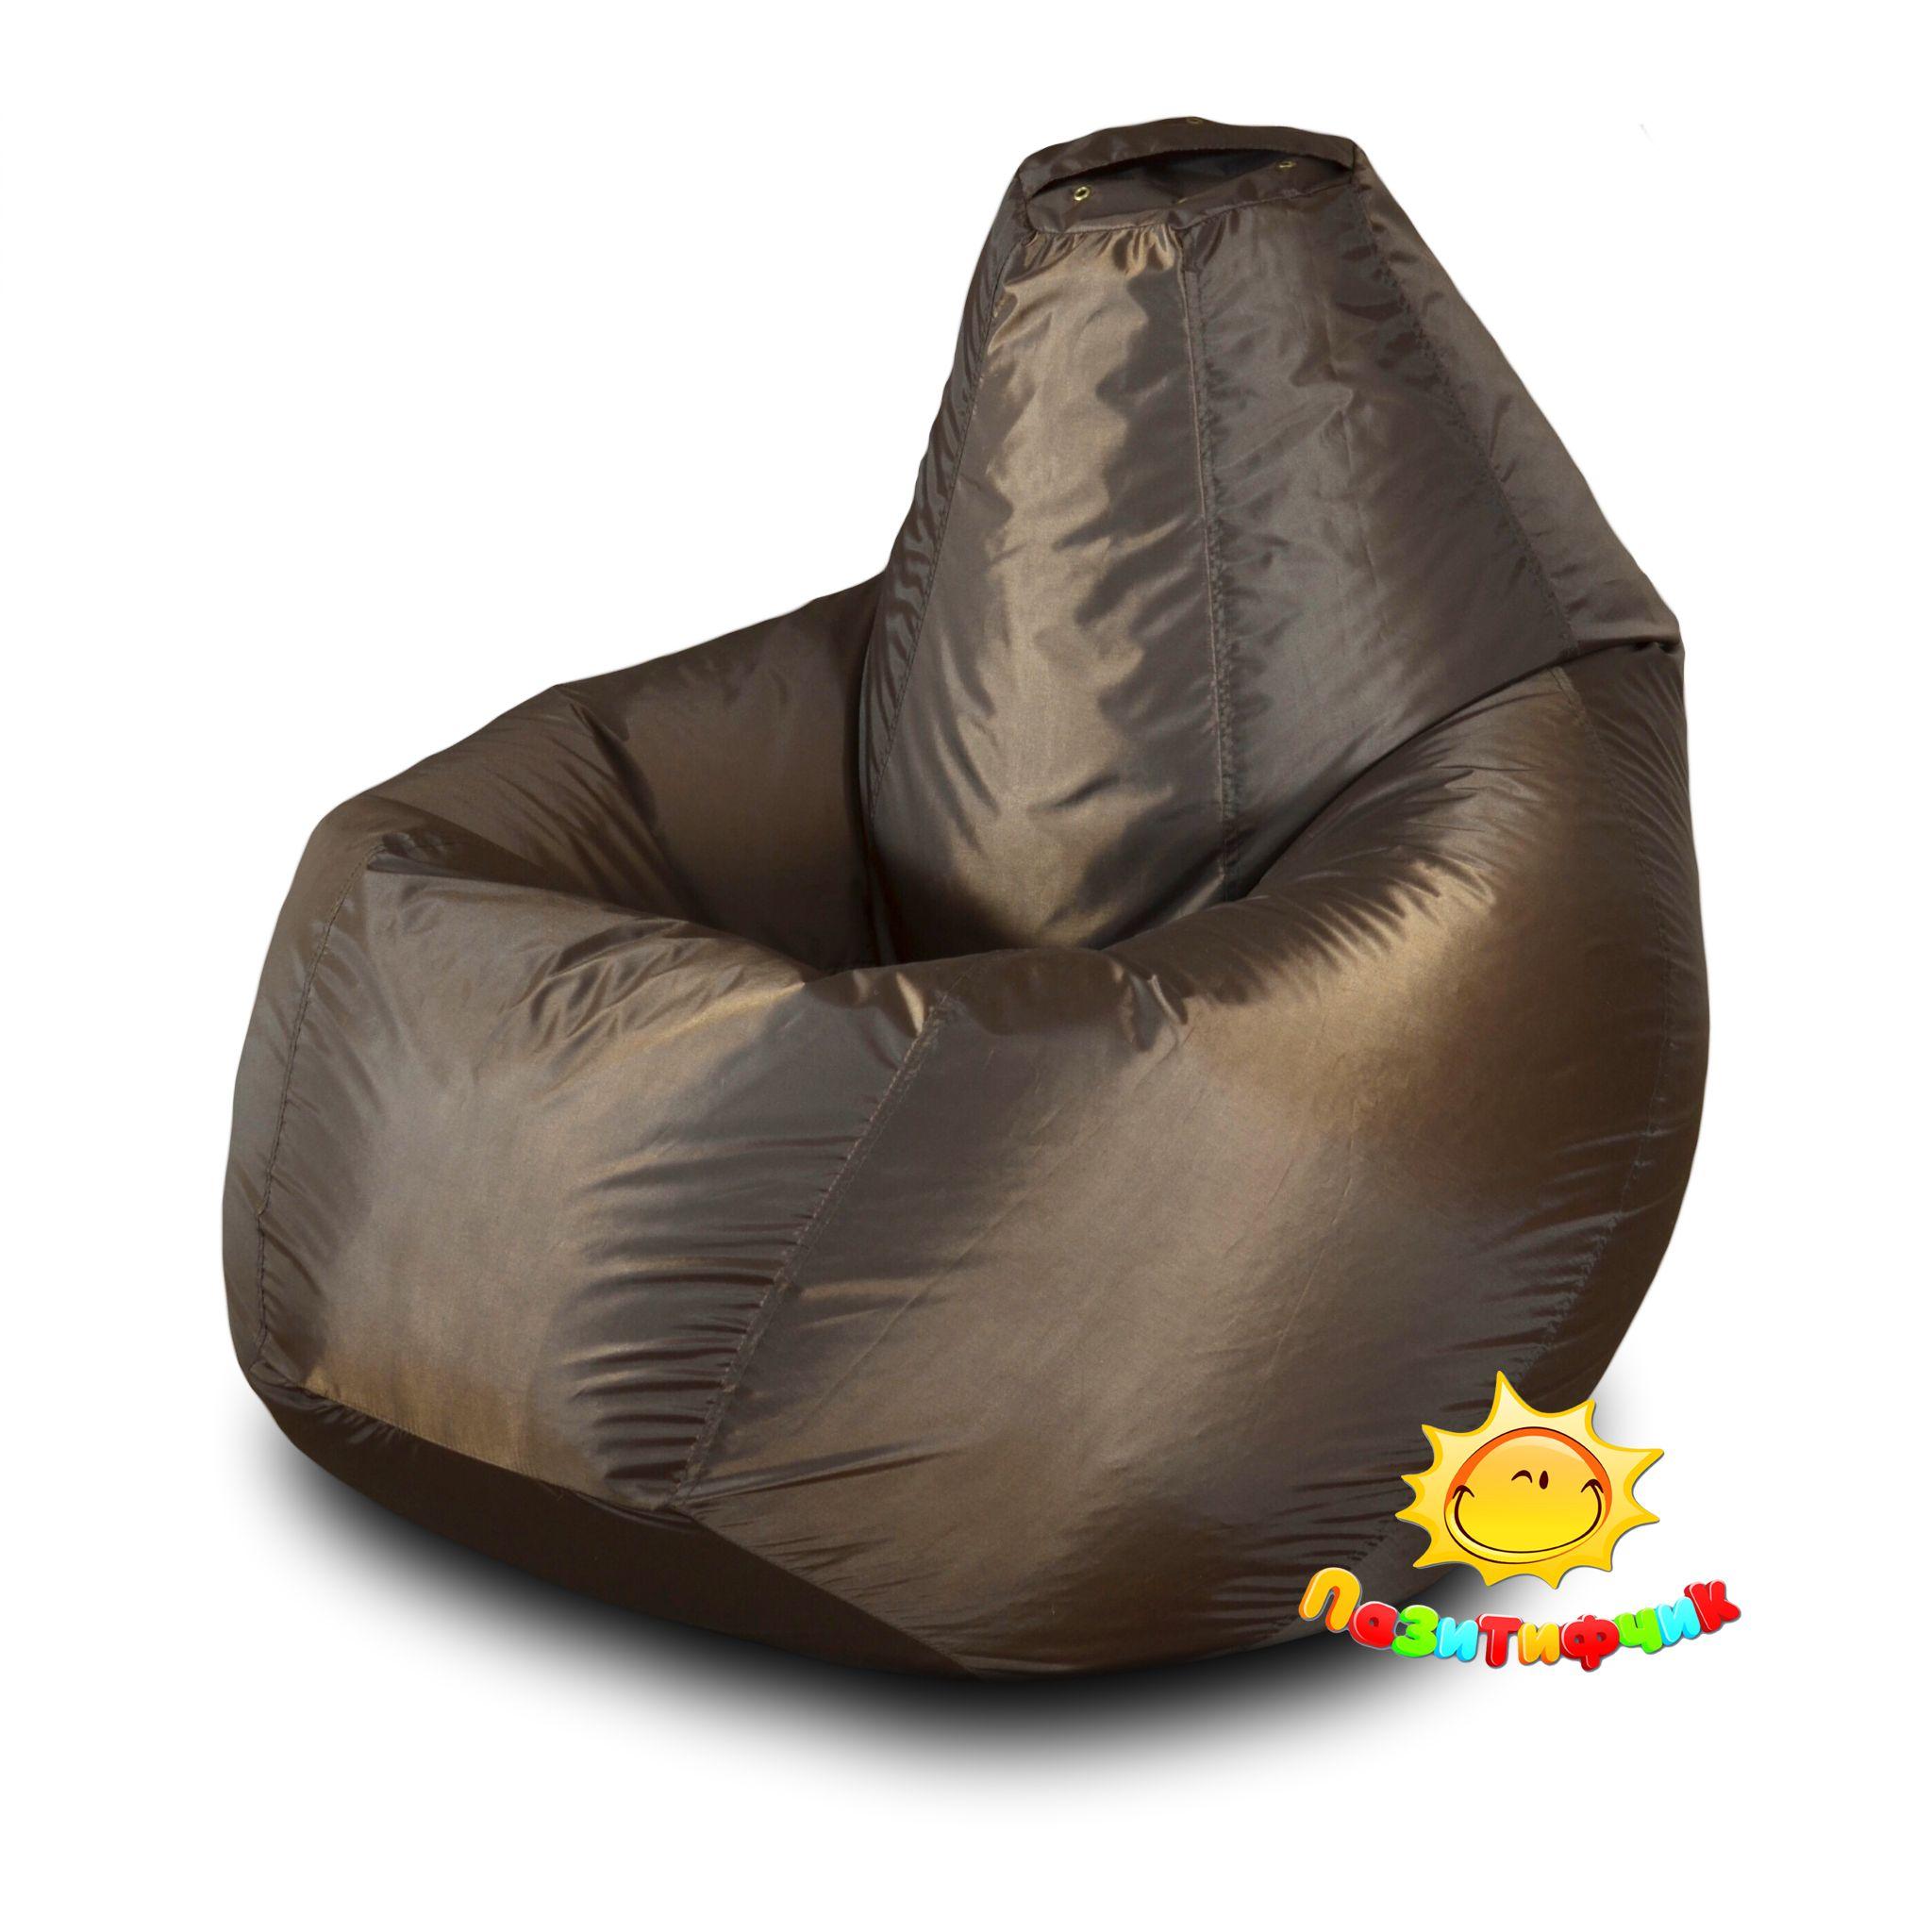 Кресло-мешок Pazitif Груша Пазитифчик, размер XL, оксфорд, шоколад